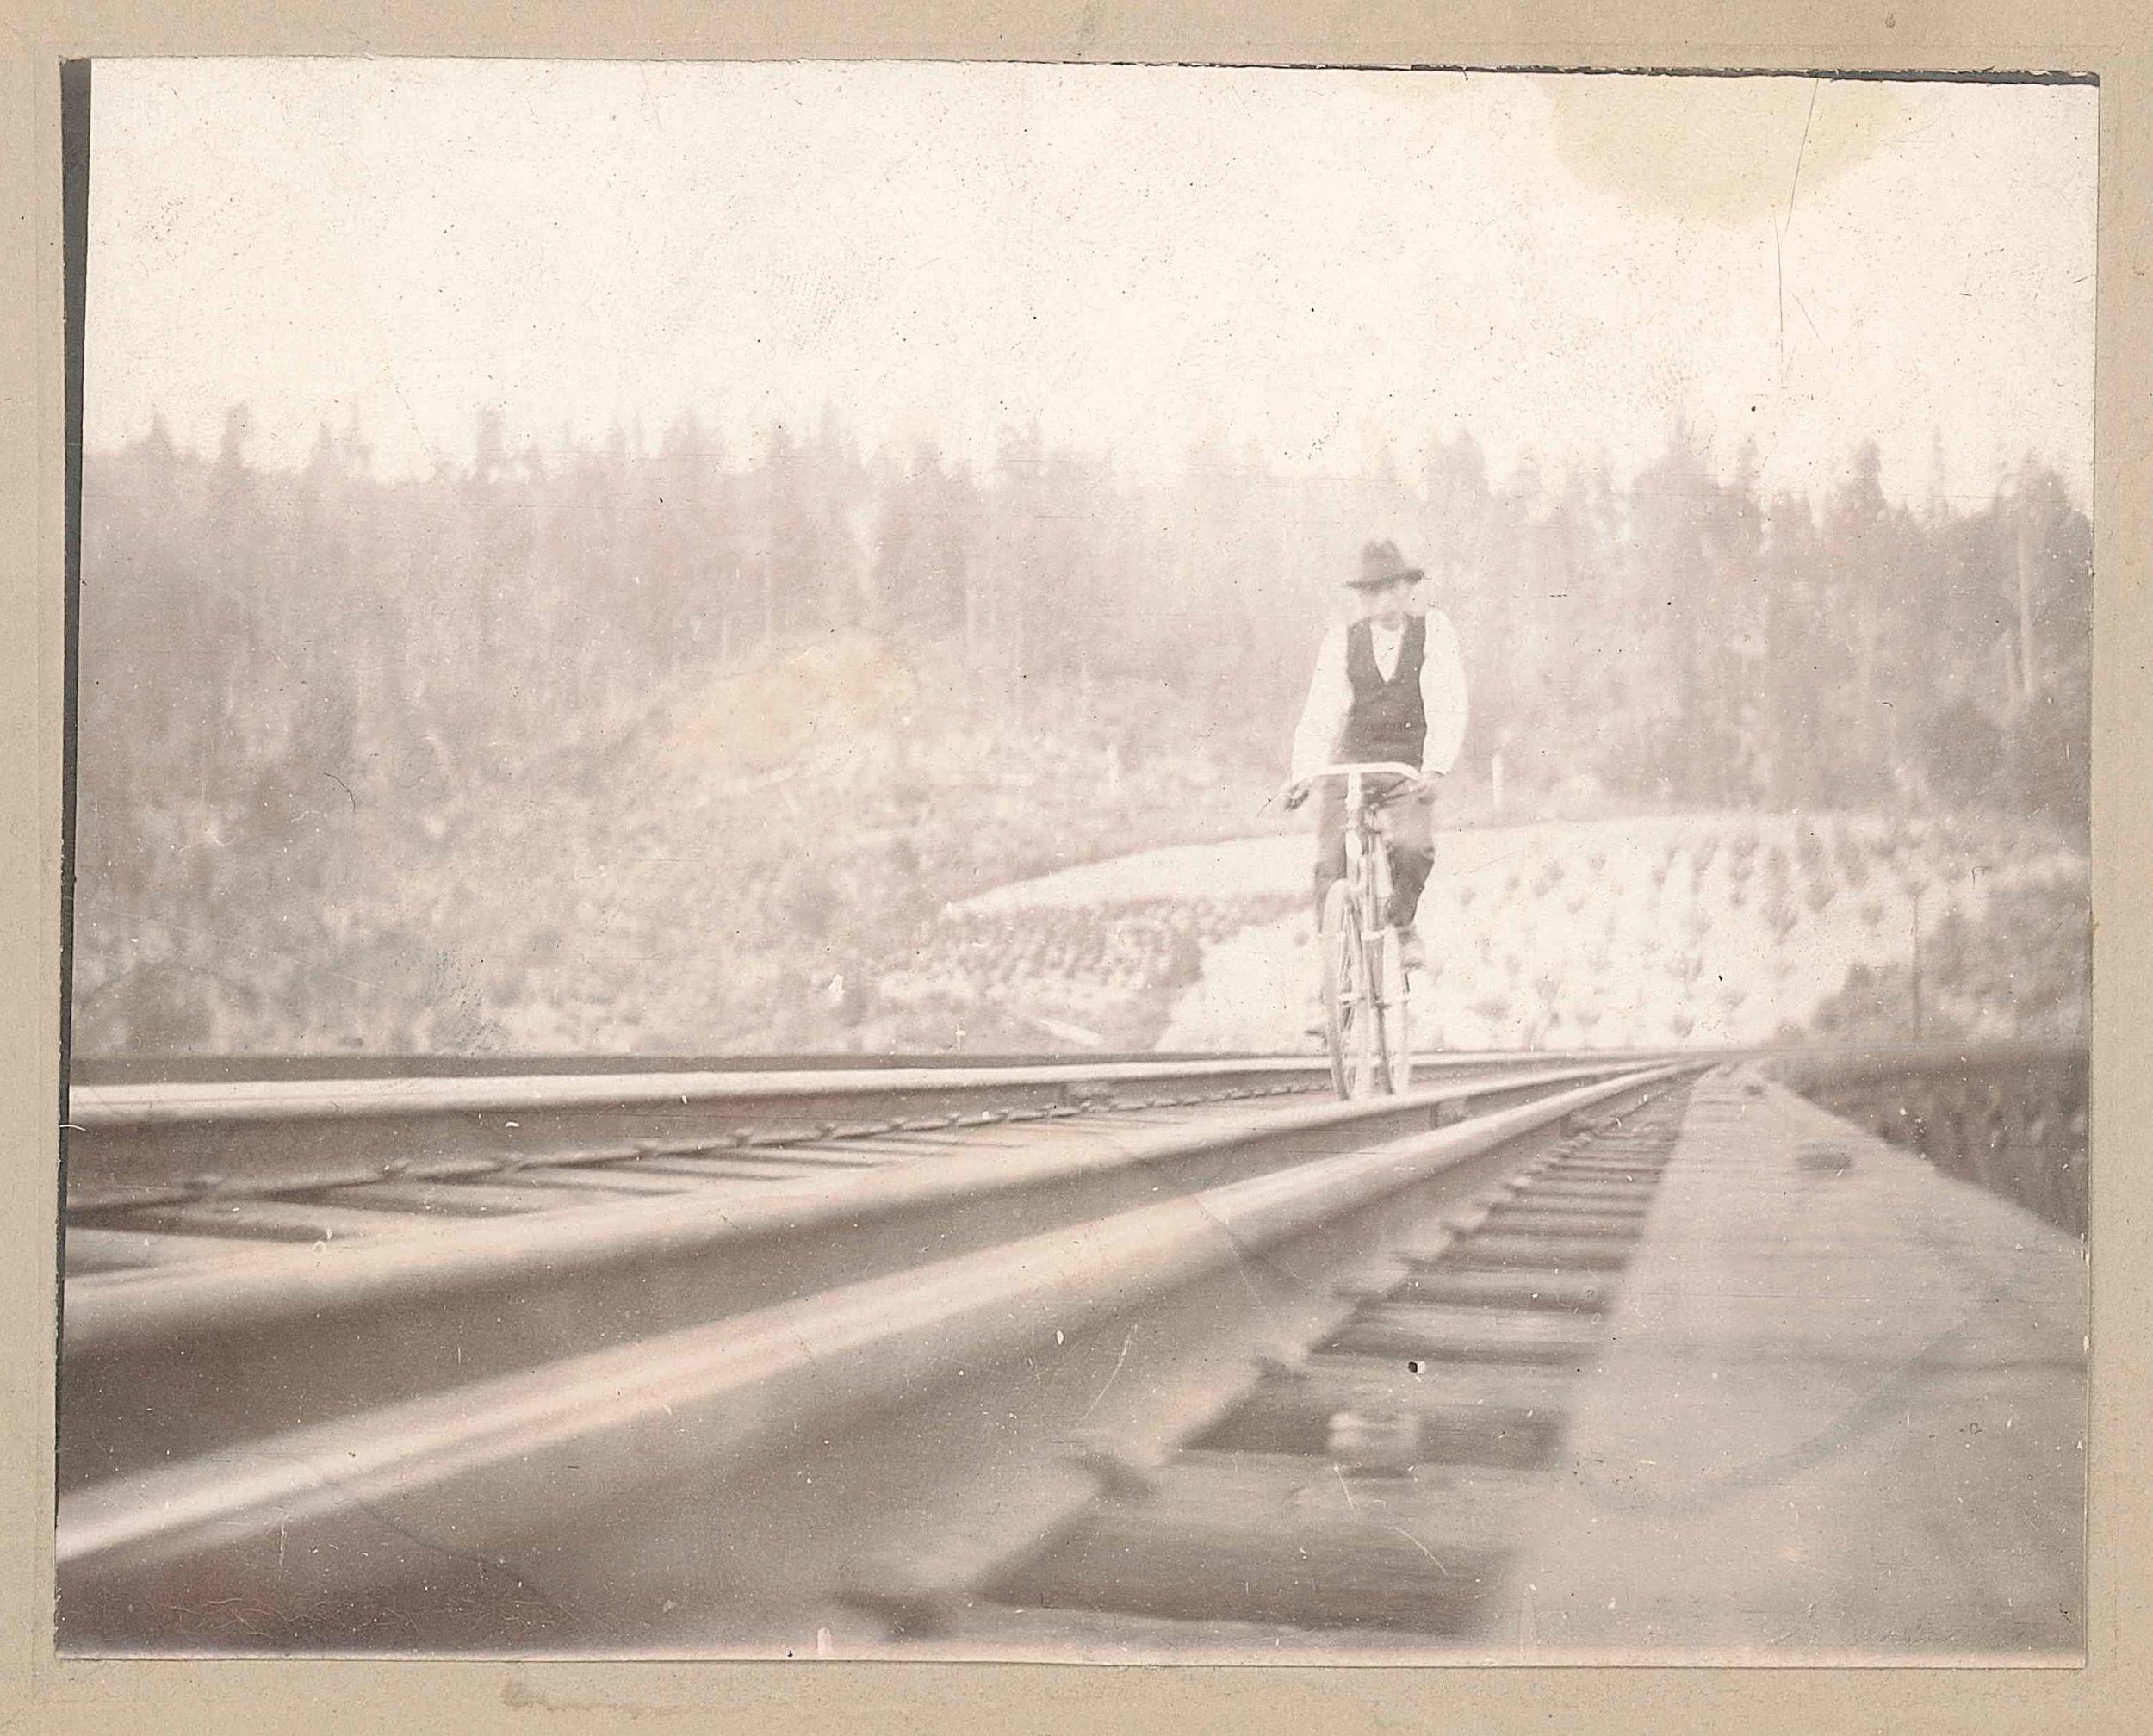 railcar-historic.jpg